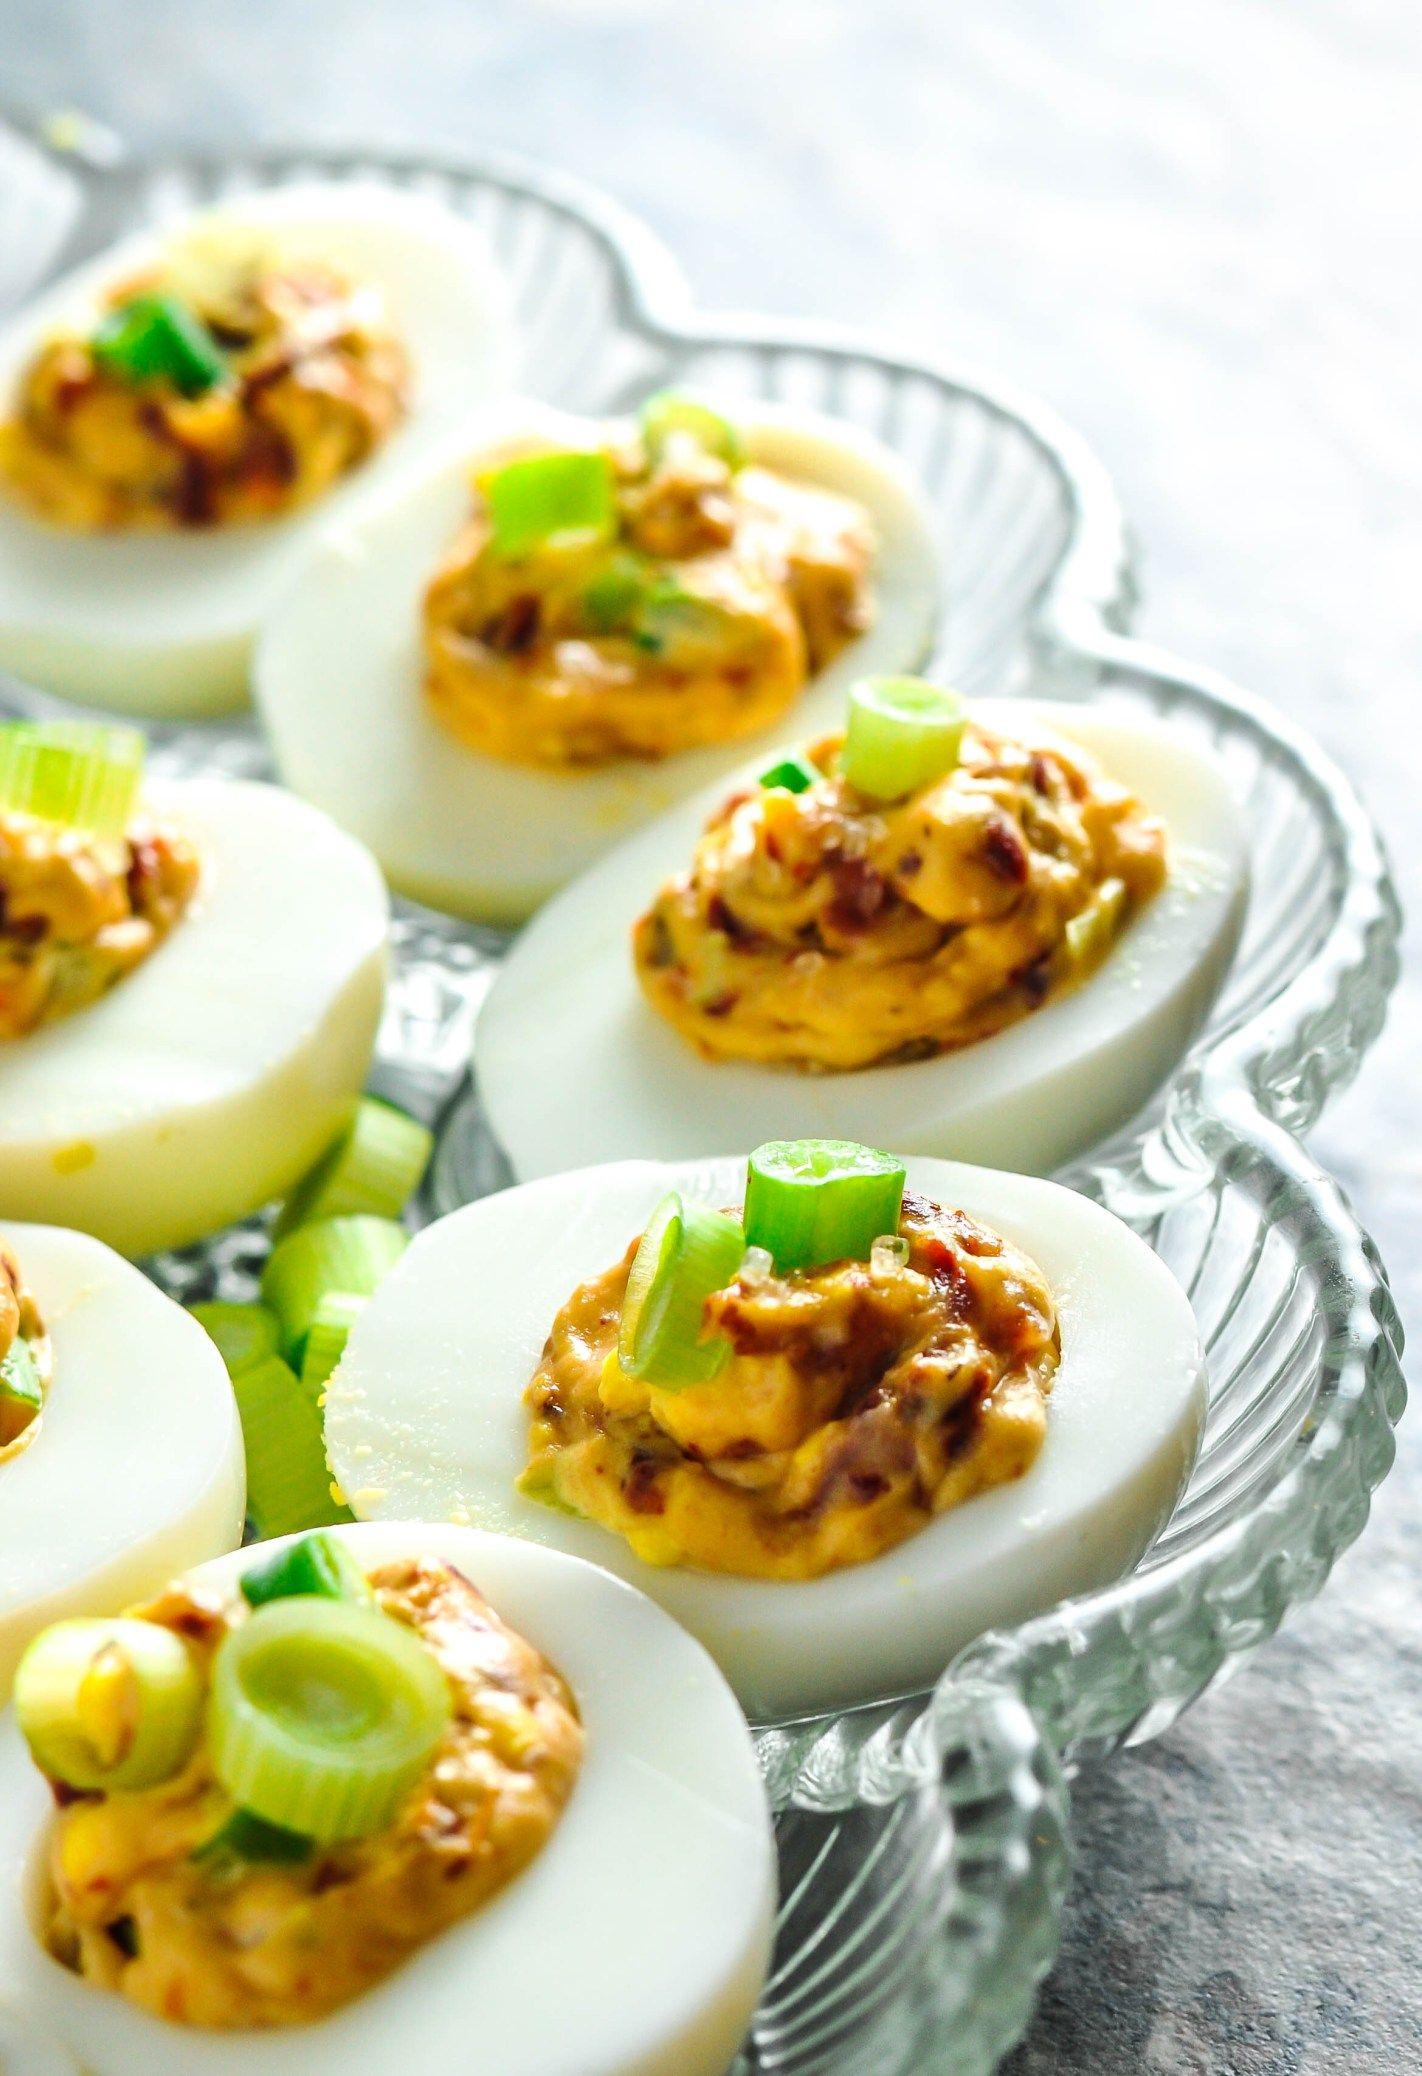 Blt deviled eggs recipe food pinterest hardboiled keto and devil food blt deviled eggs recipe forumfinder Gallery